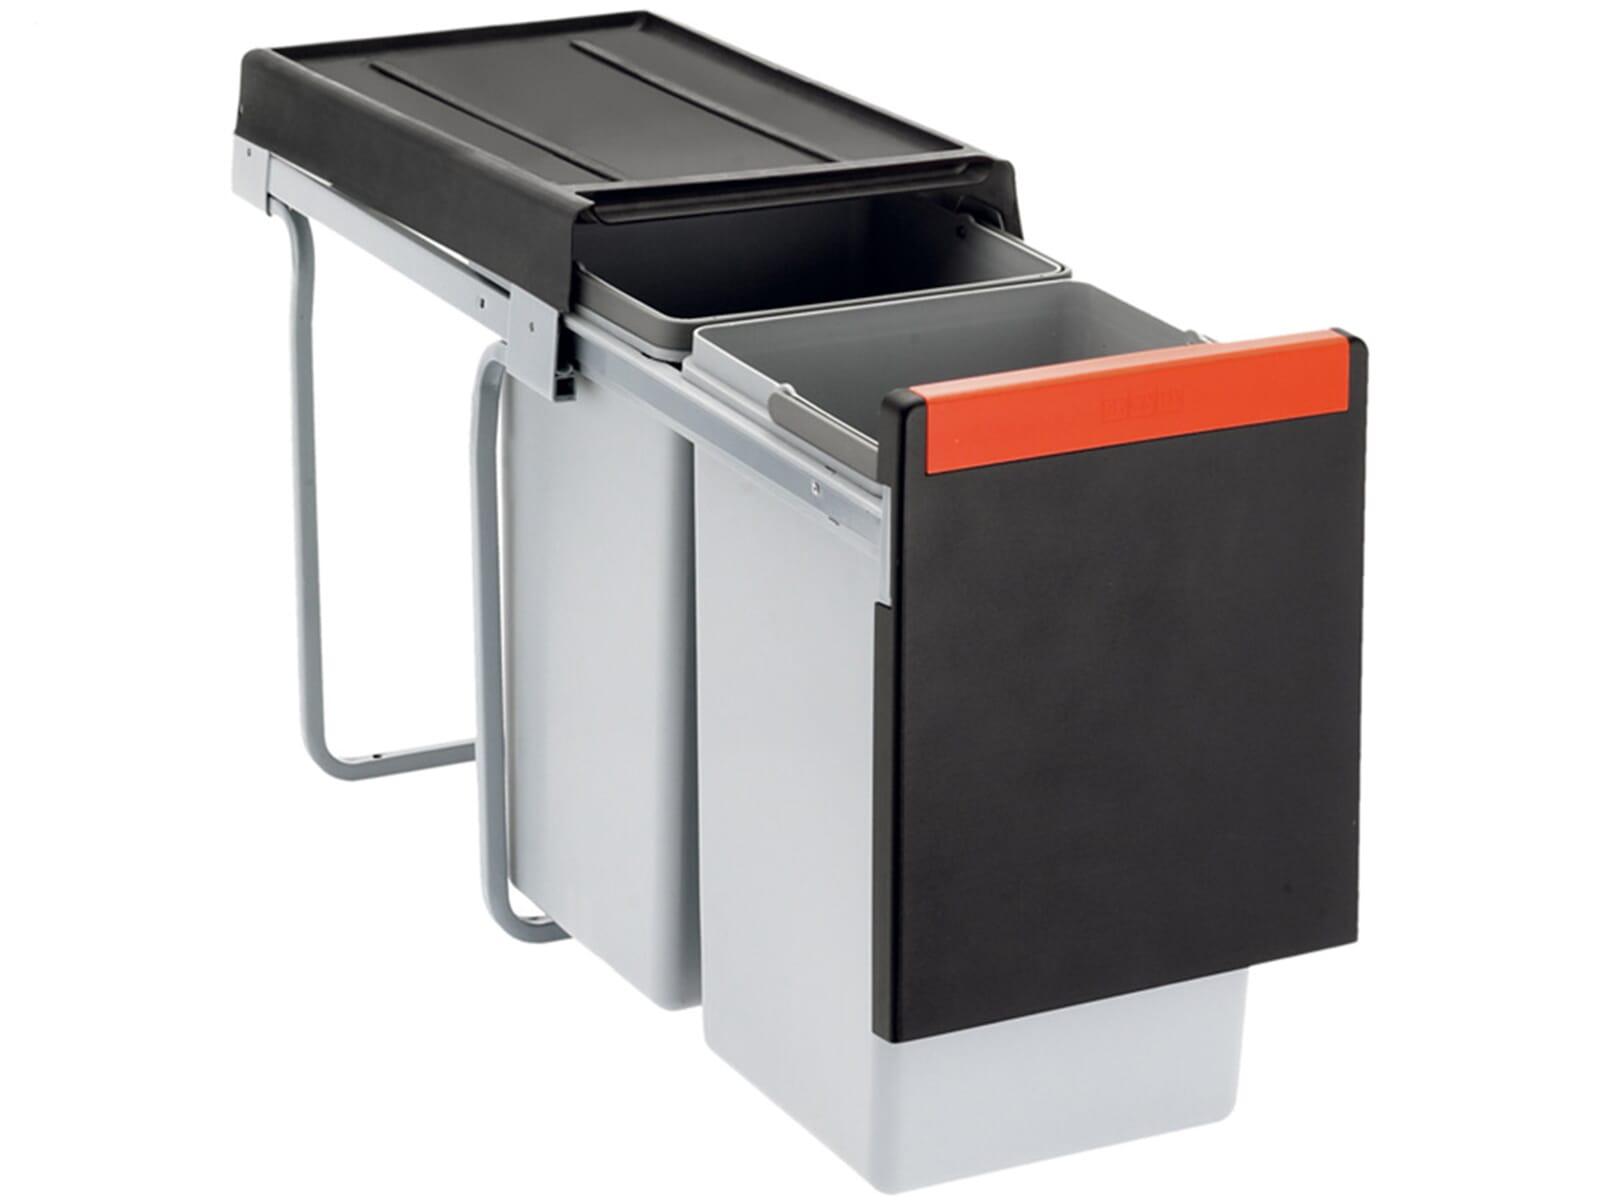 Produktabbildung Franke Sorter Cube 30 - 134.0039.554 Einbau Abfallsammler